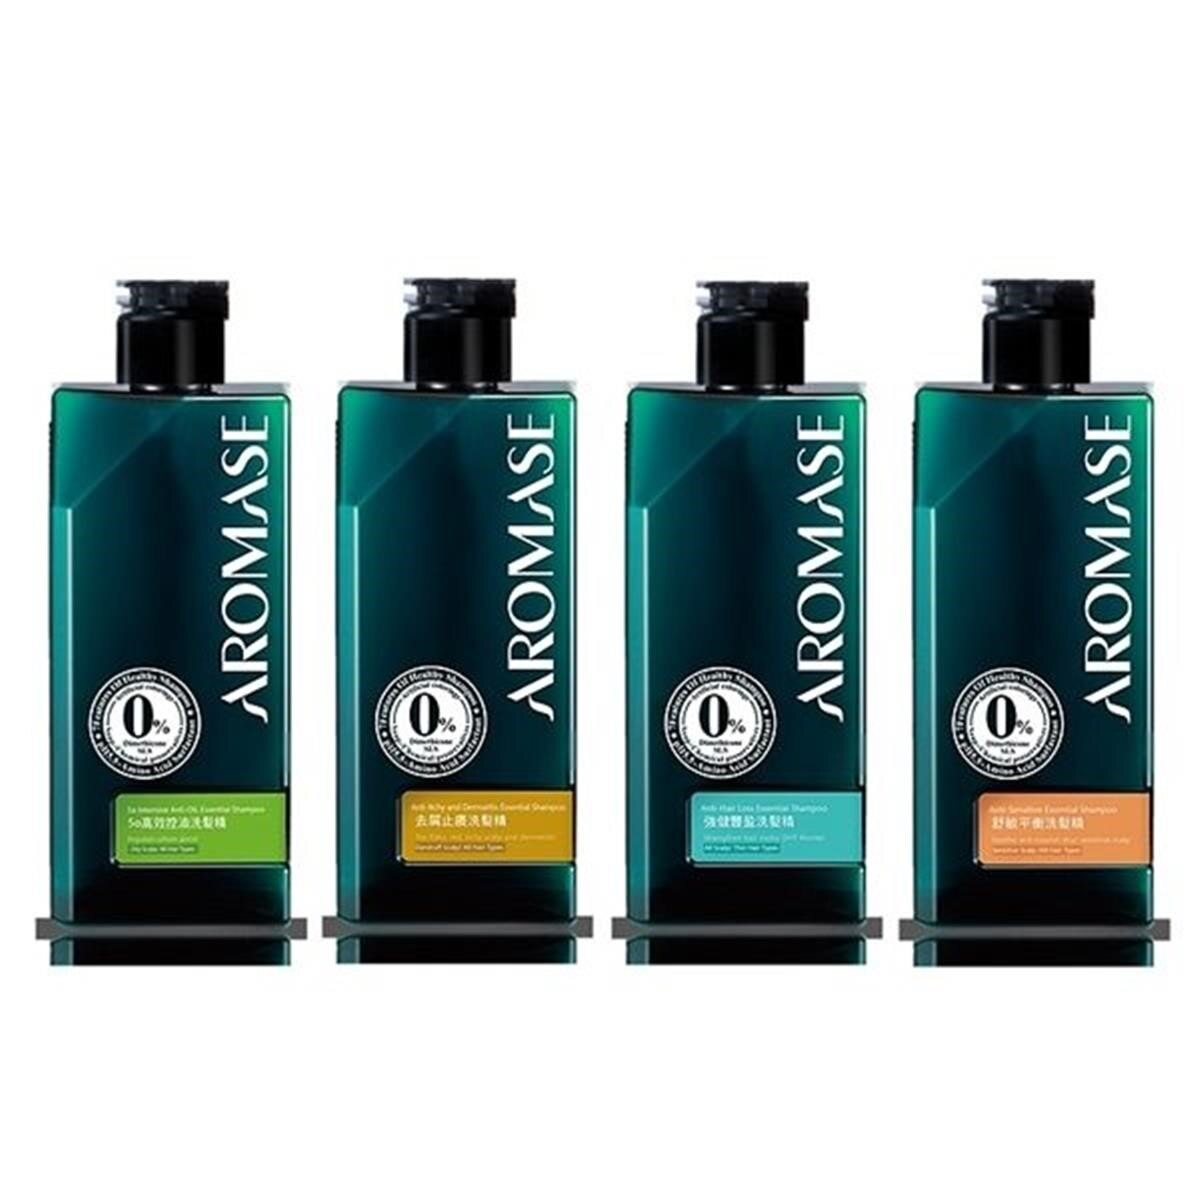 【Aromase 艾瑪絲】5a高效控油/去屑止癢/強健豐盈/舒敏平衡 洗髮精(高階版)90ml